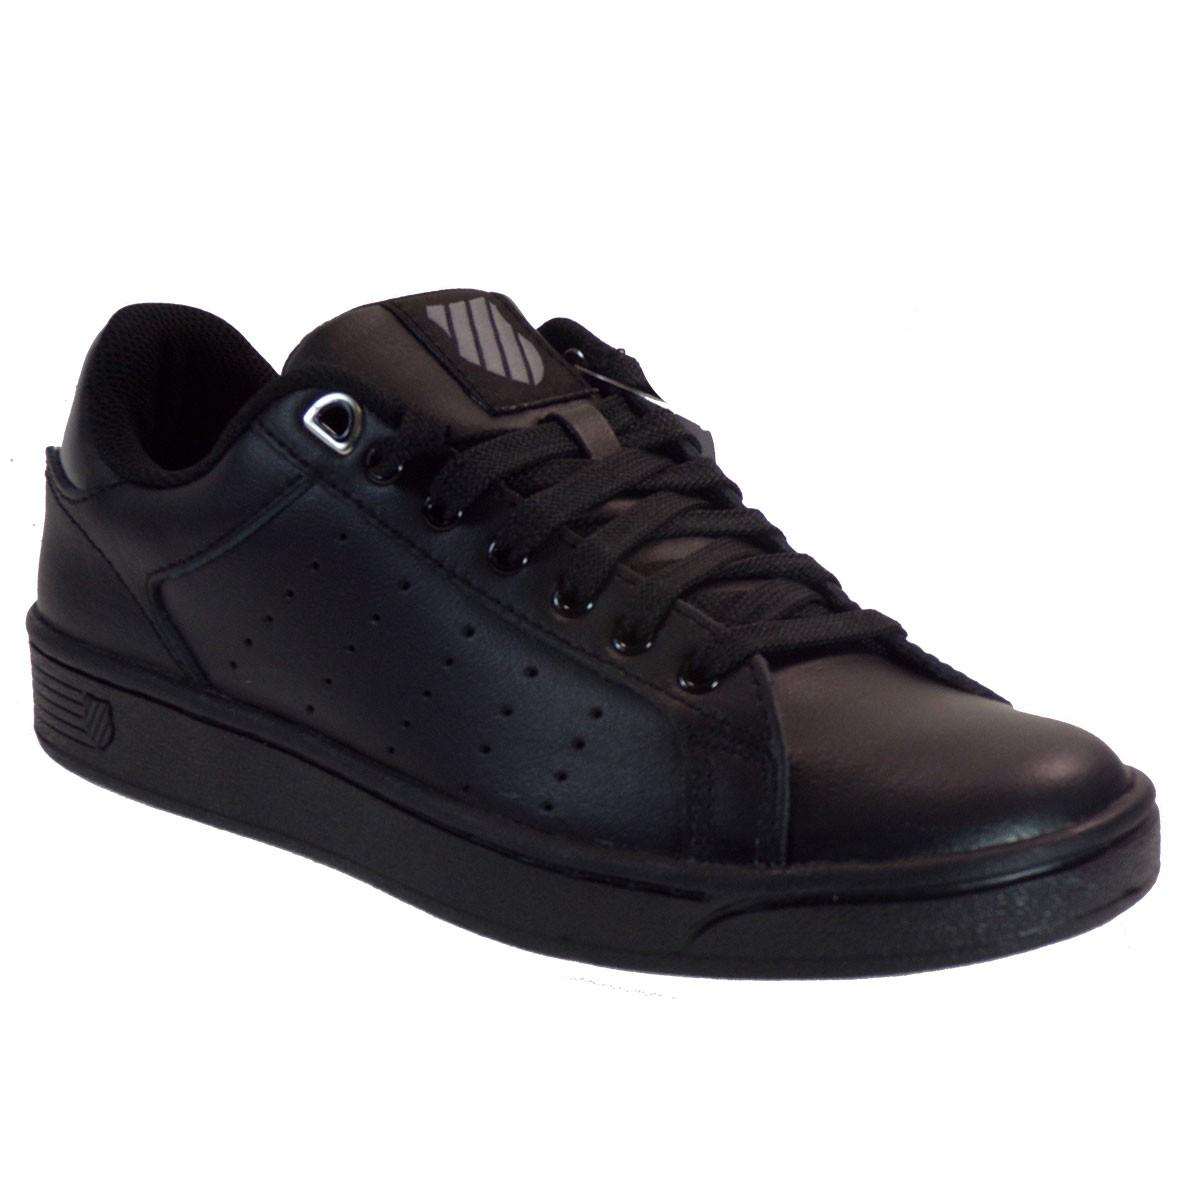 K-SWISS Γυναικεία Παπούτσια Sneakers 95373-006 Μαύρο 868291828